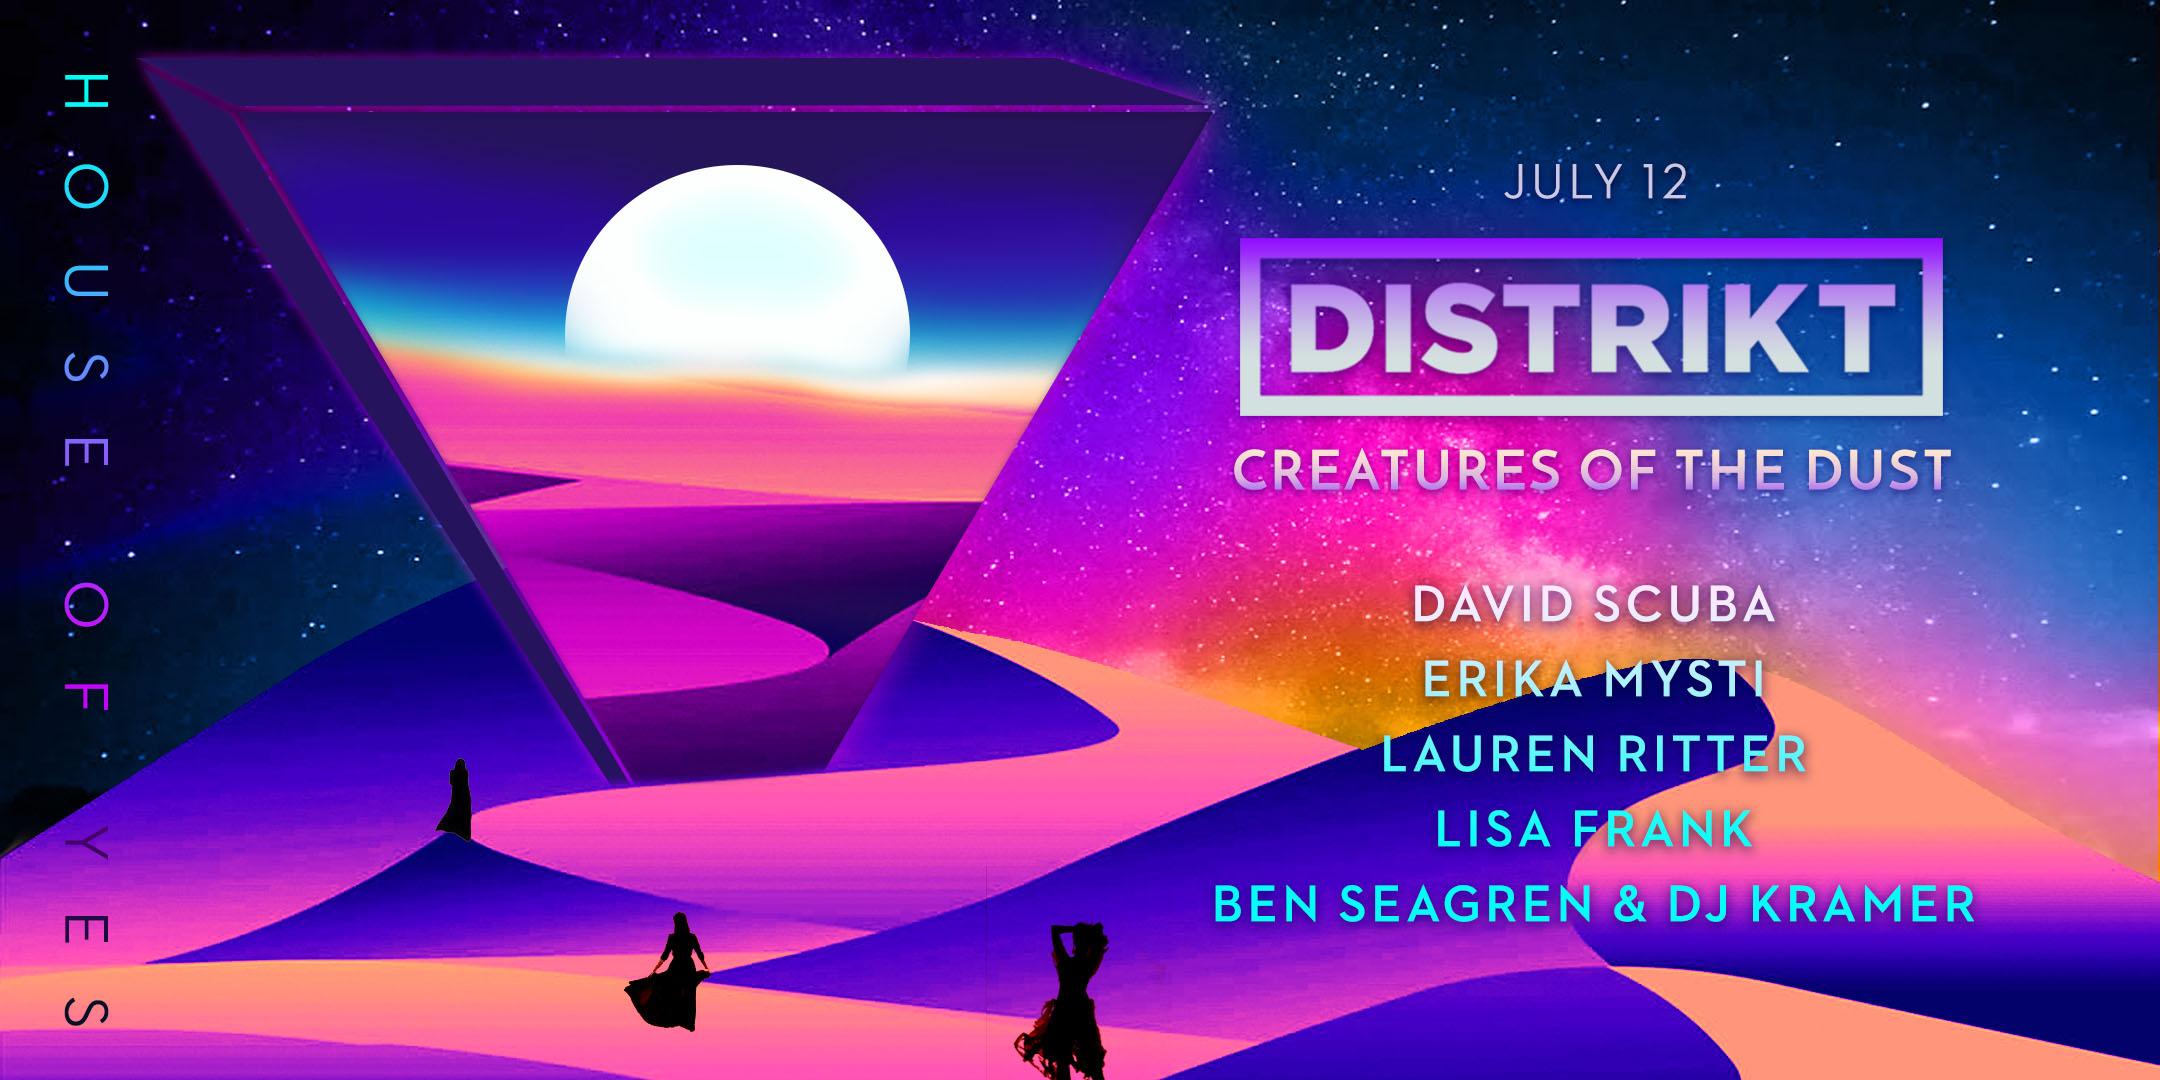 Distrikt Creatures of DustFB_EV.jpg